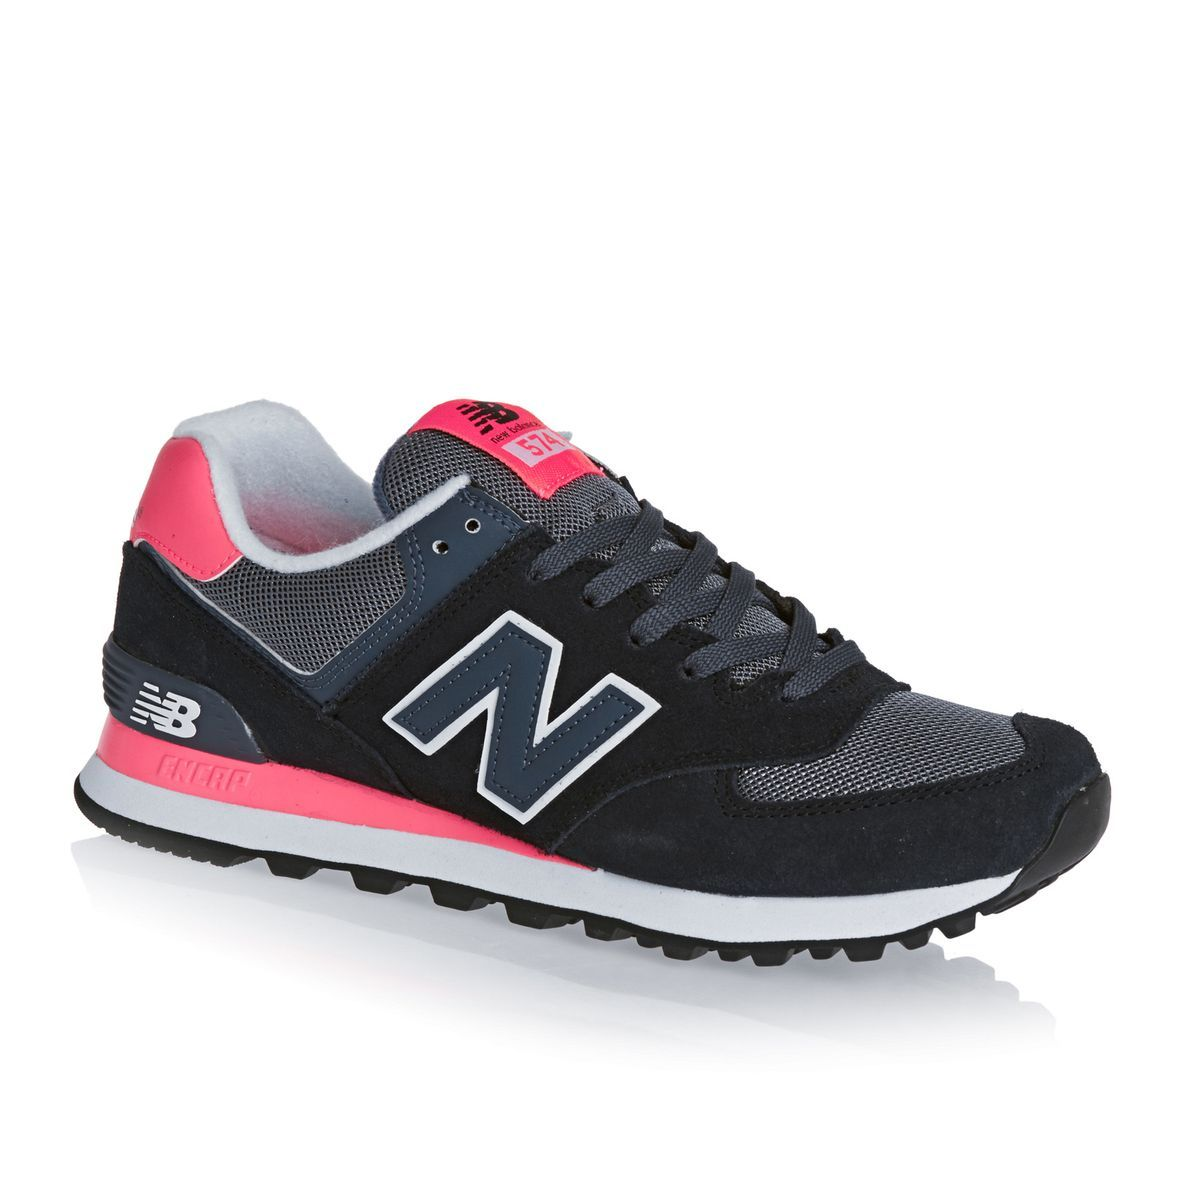 978131a06ce26 New Balance Shoes - New Balance 574 Shoes - Black/Pink ...